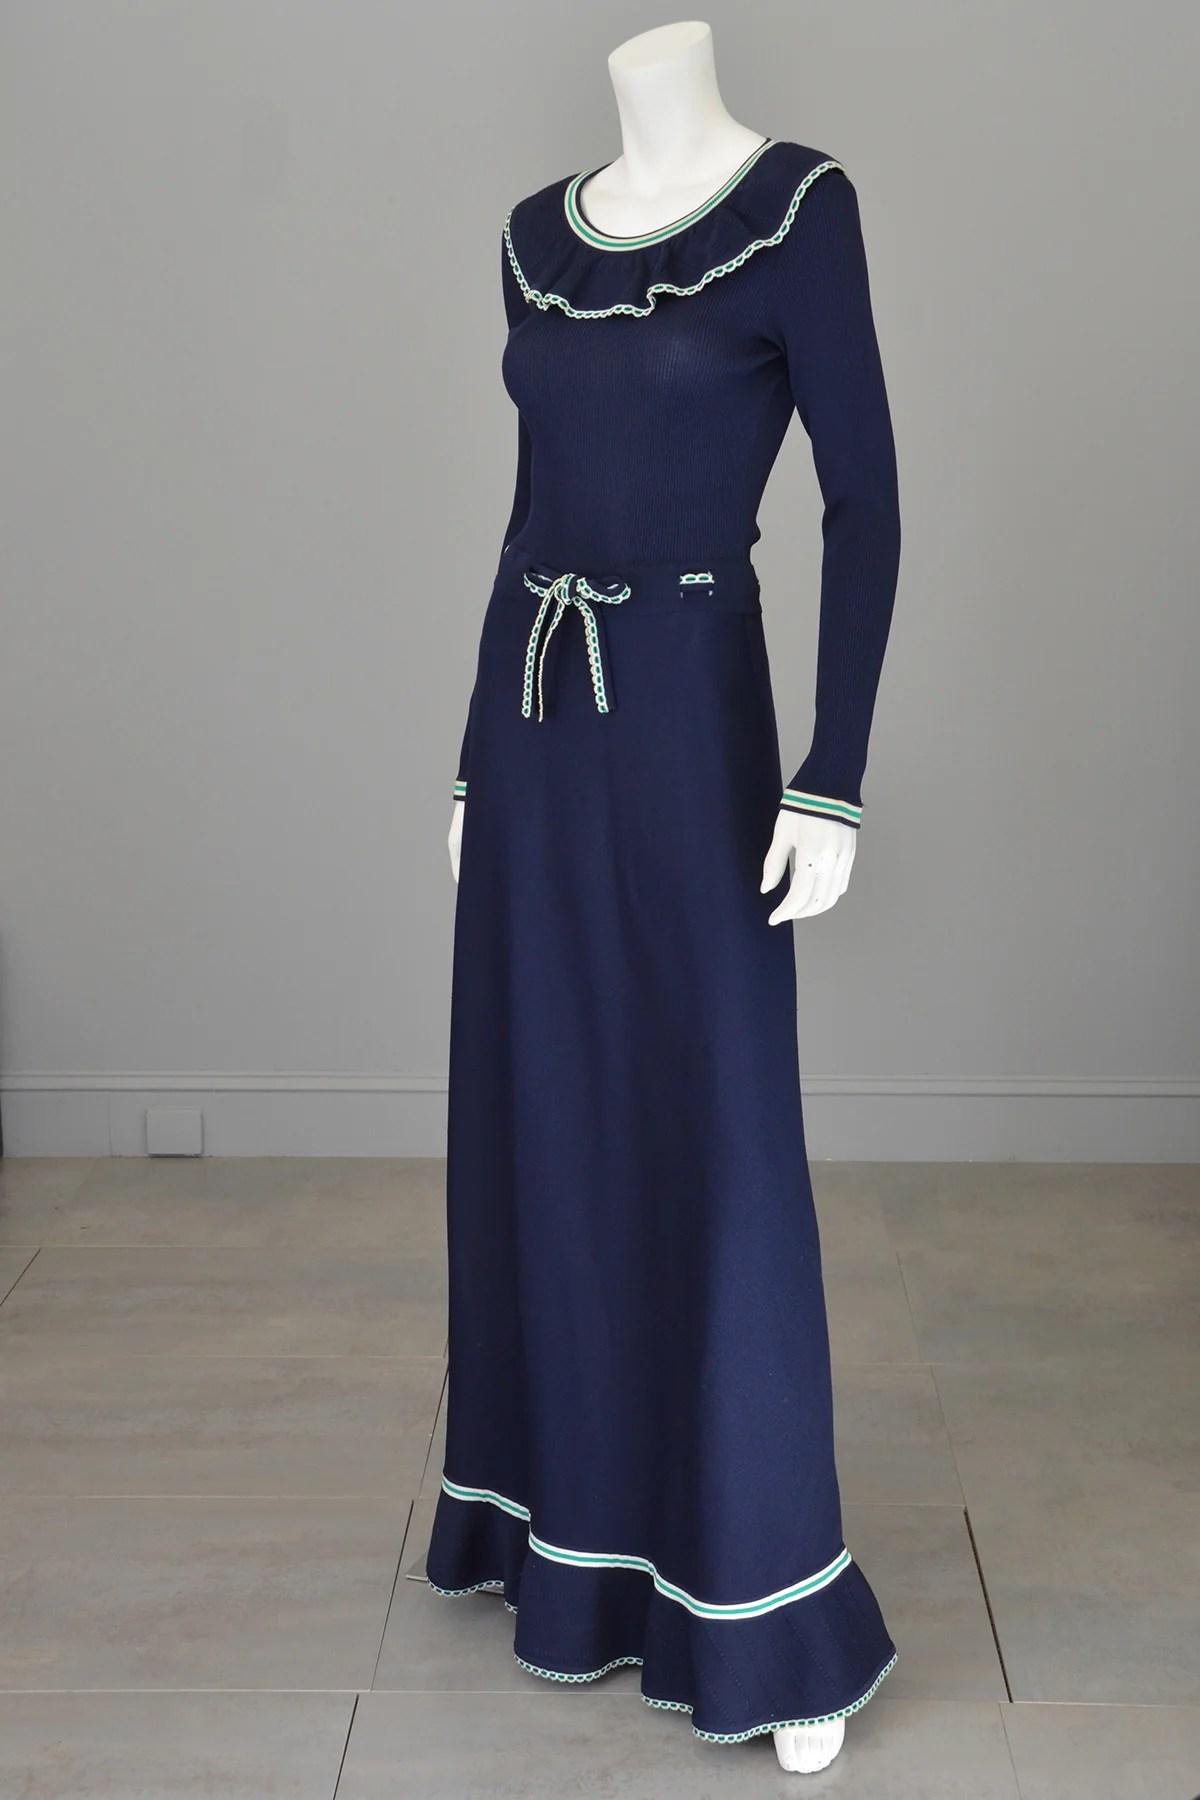 Navy Blue Knit Maxi Dresses